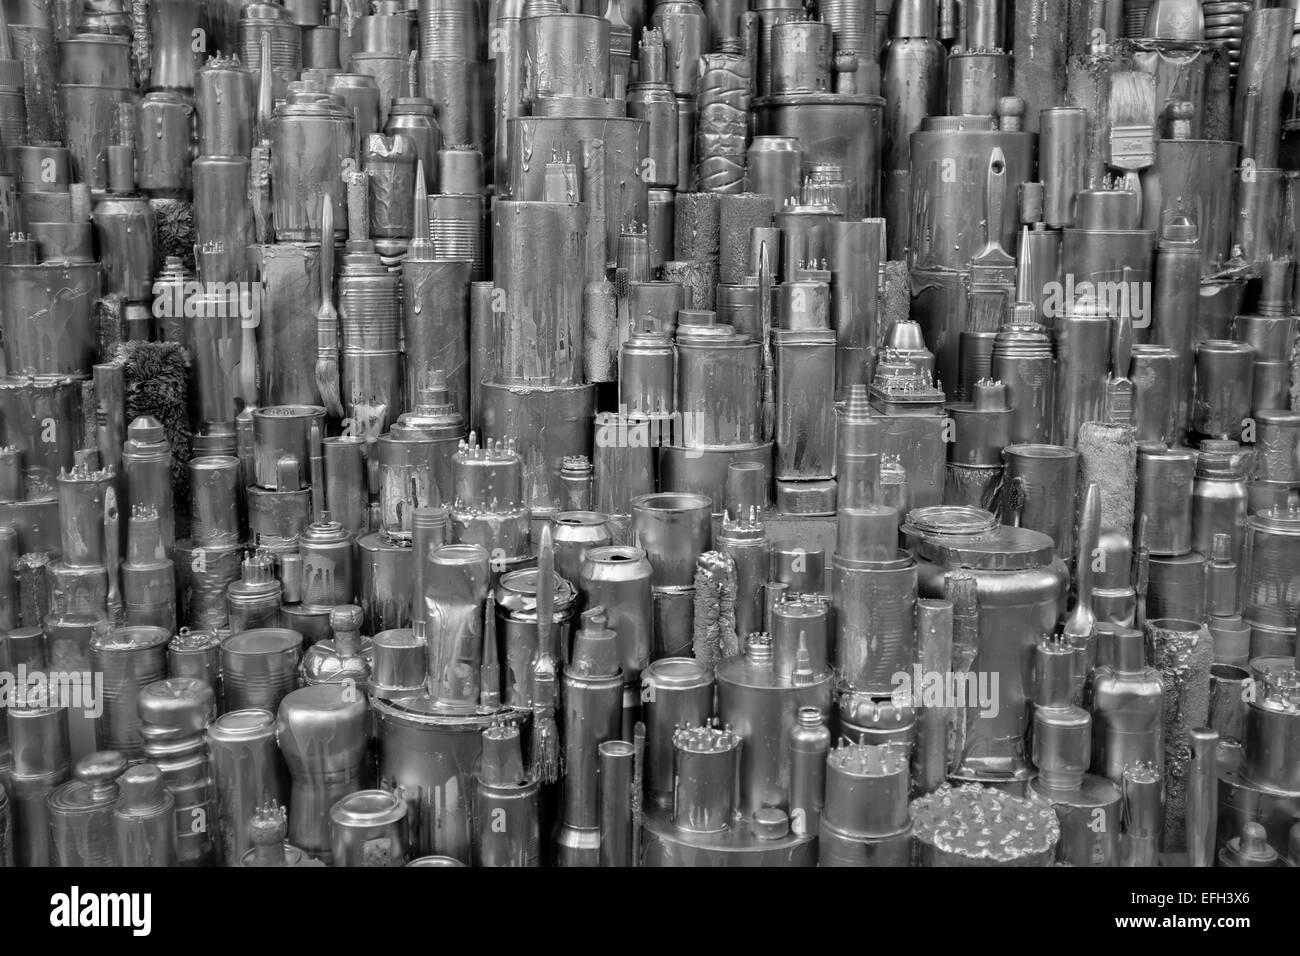 Selfridges London Window Display. - Stock Image